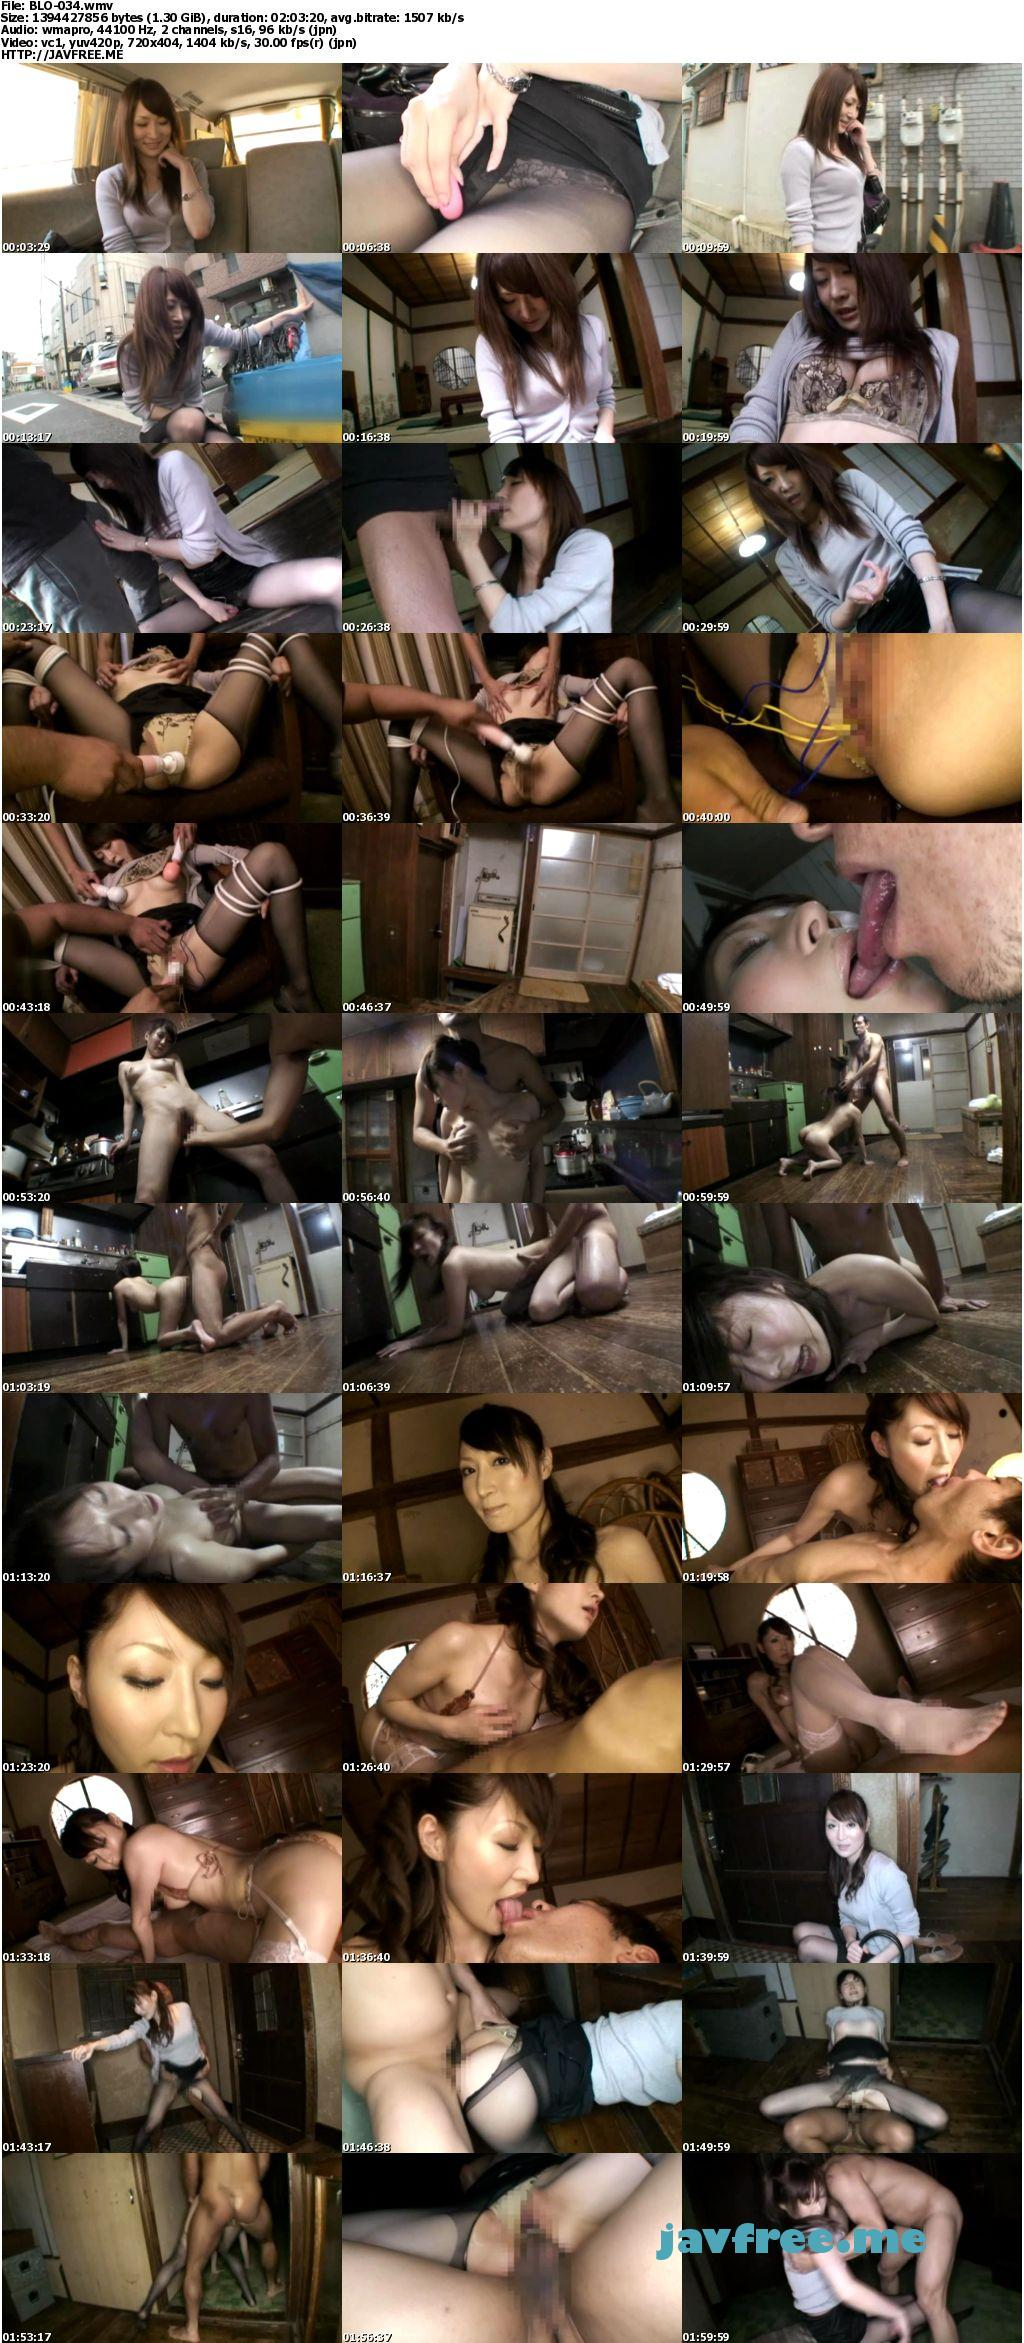 [BLO 034] エロ一発妻 ~AVに応募してきた主婦たち34~ 香坂めぐ エロ一発妻 BLO